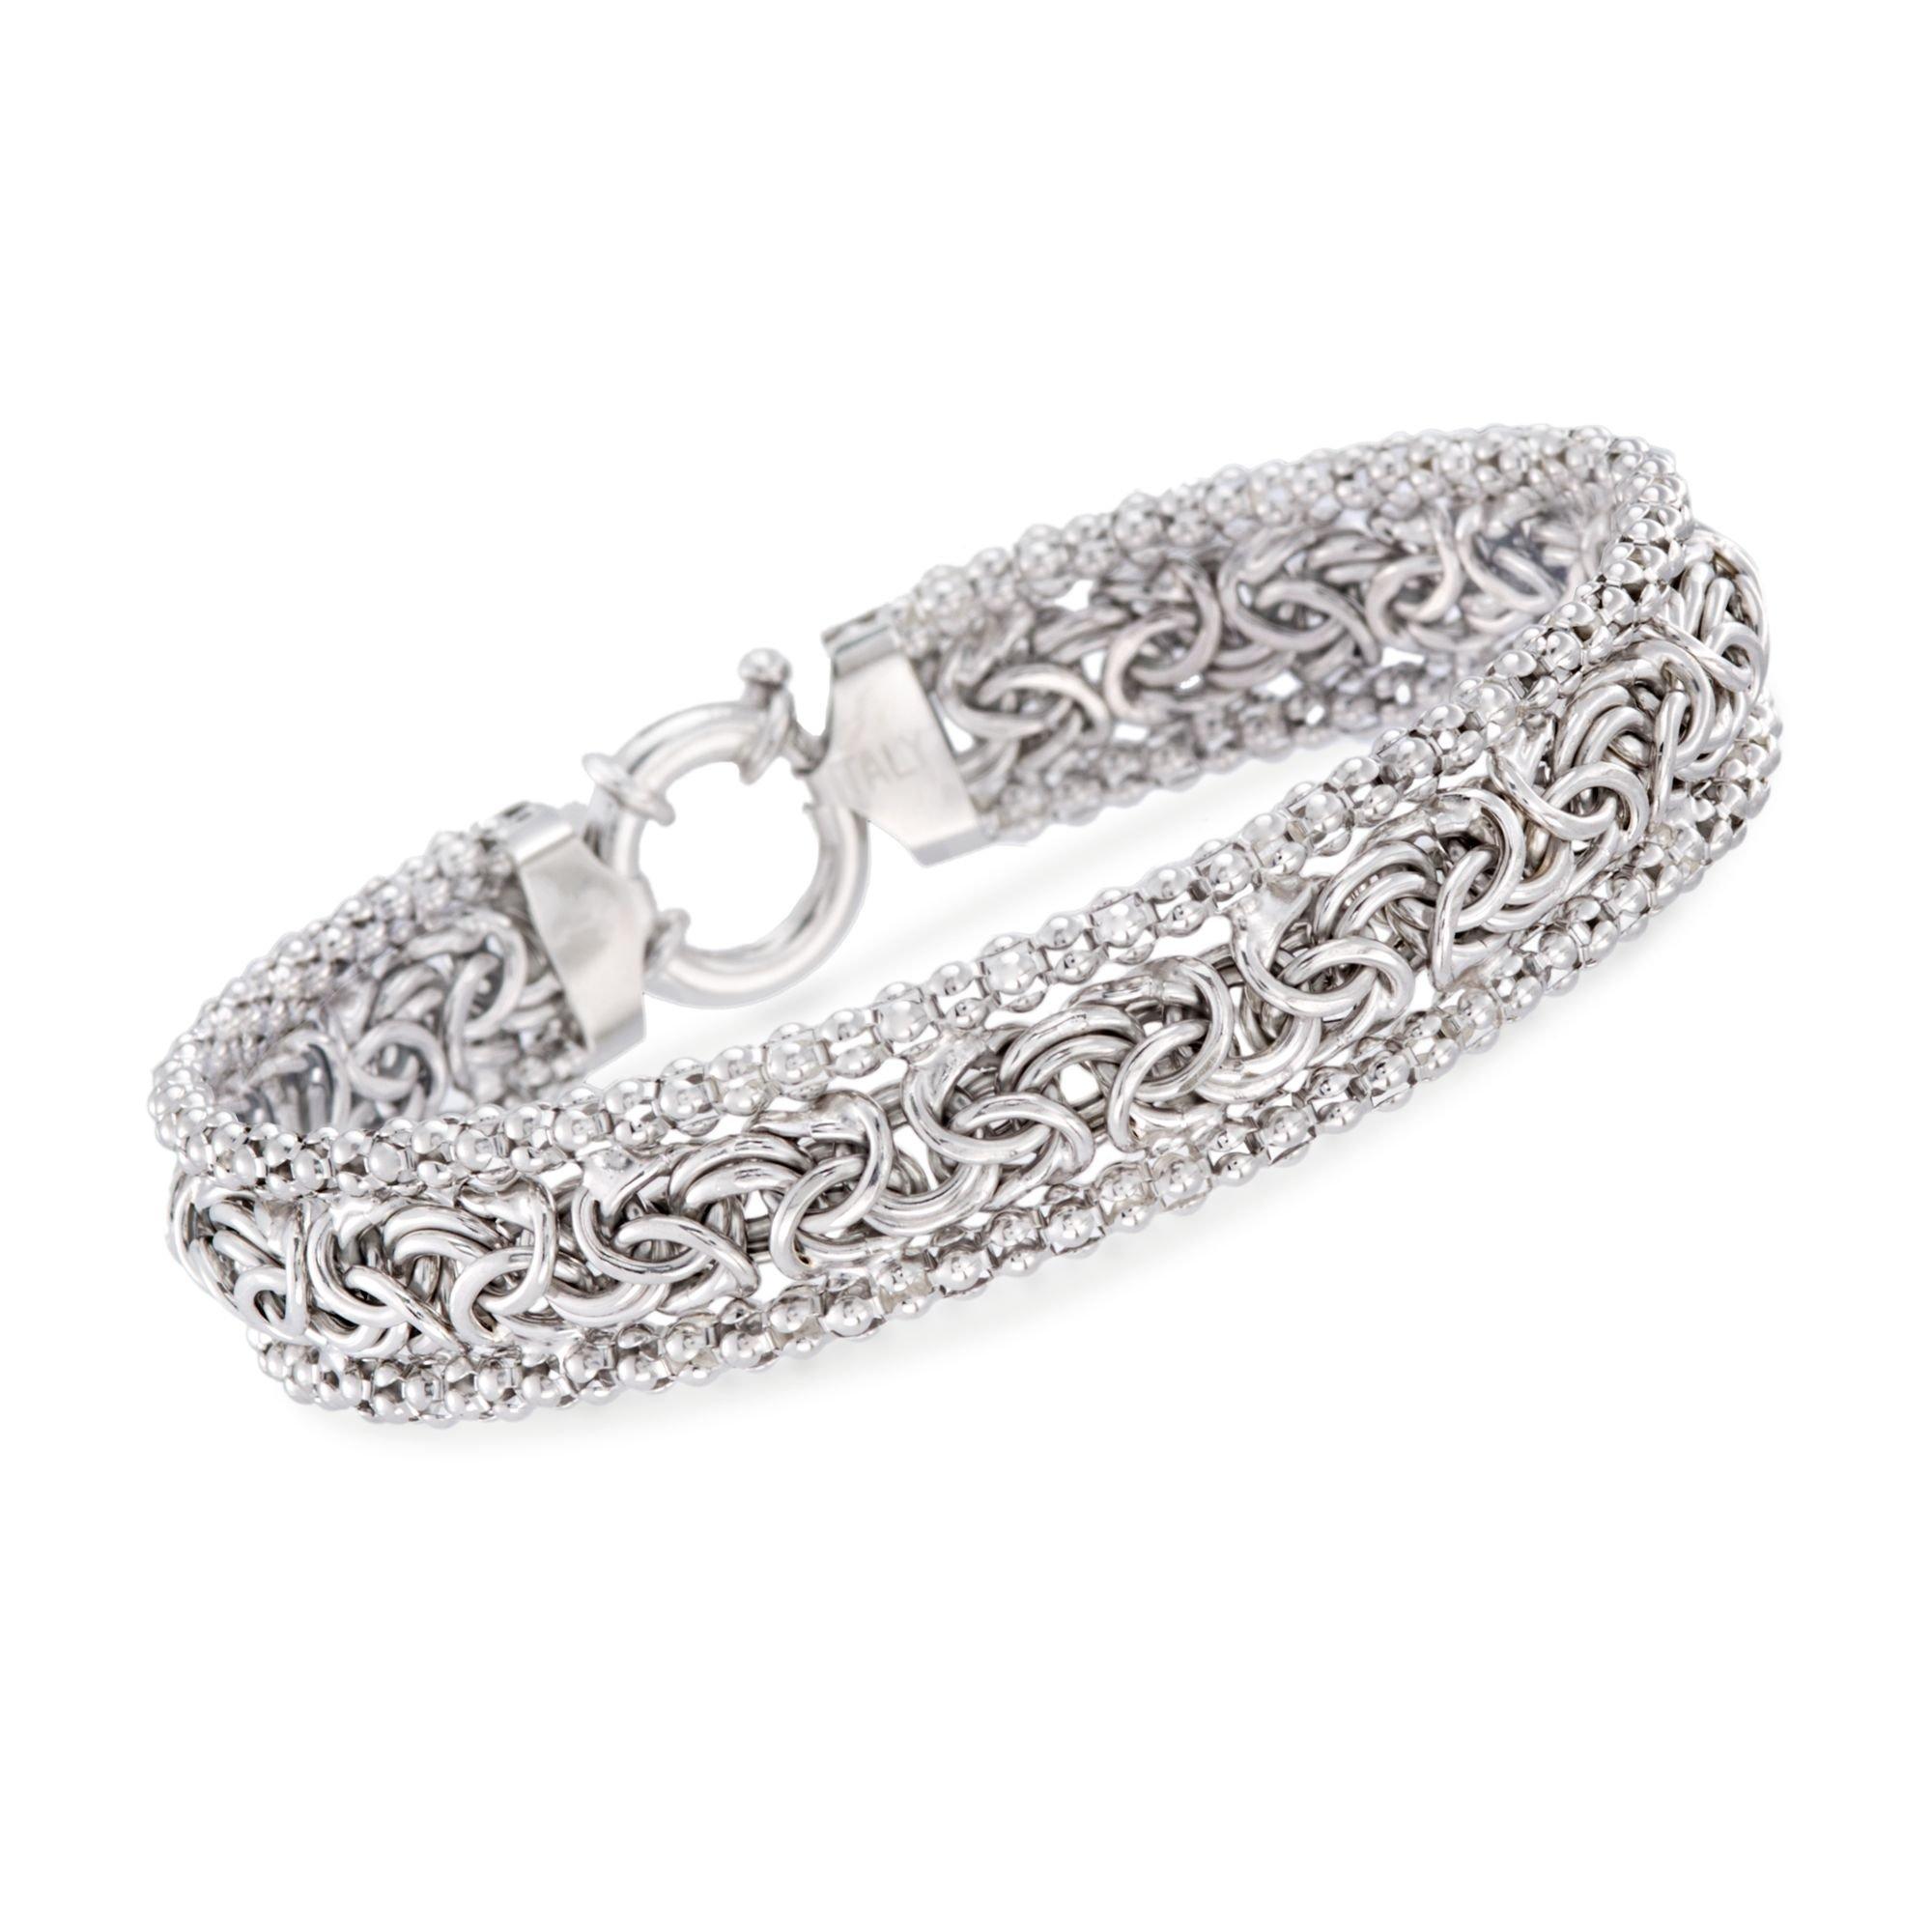 Ross-Simons Sterling Silver Beaded Byzantine Bracelet, Includes Presentation Box